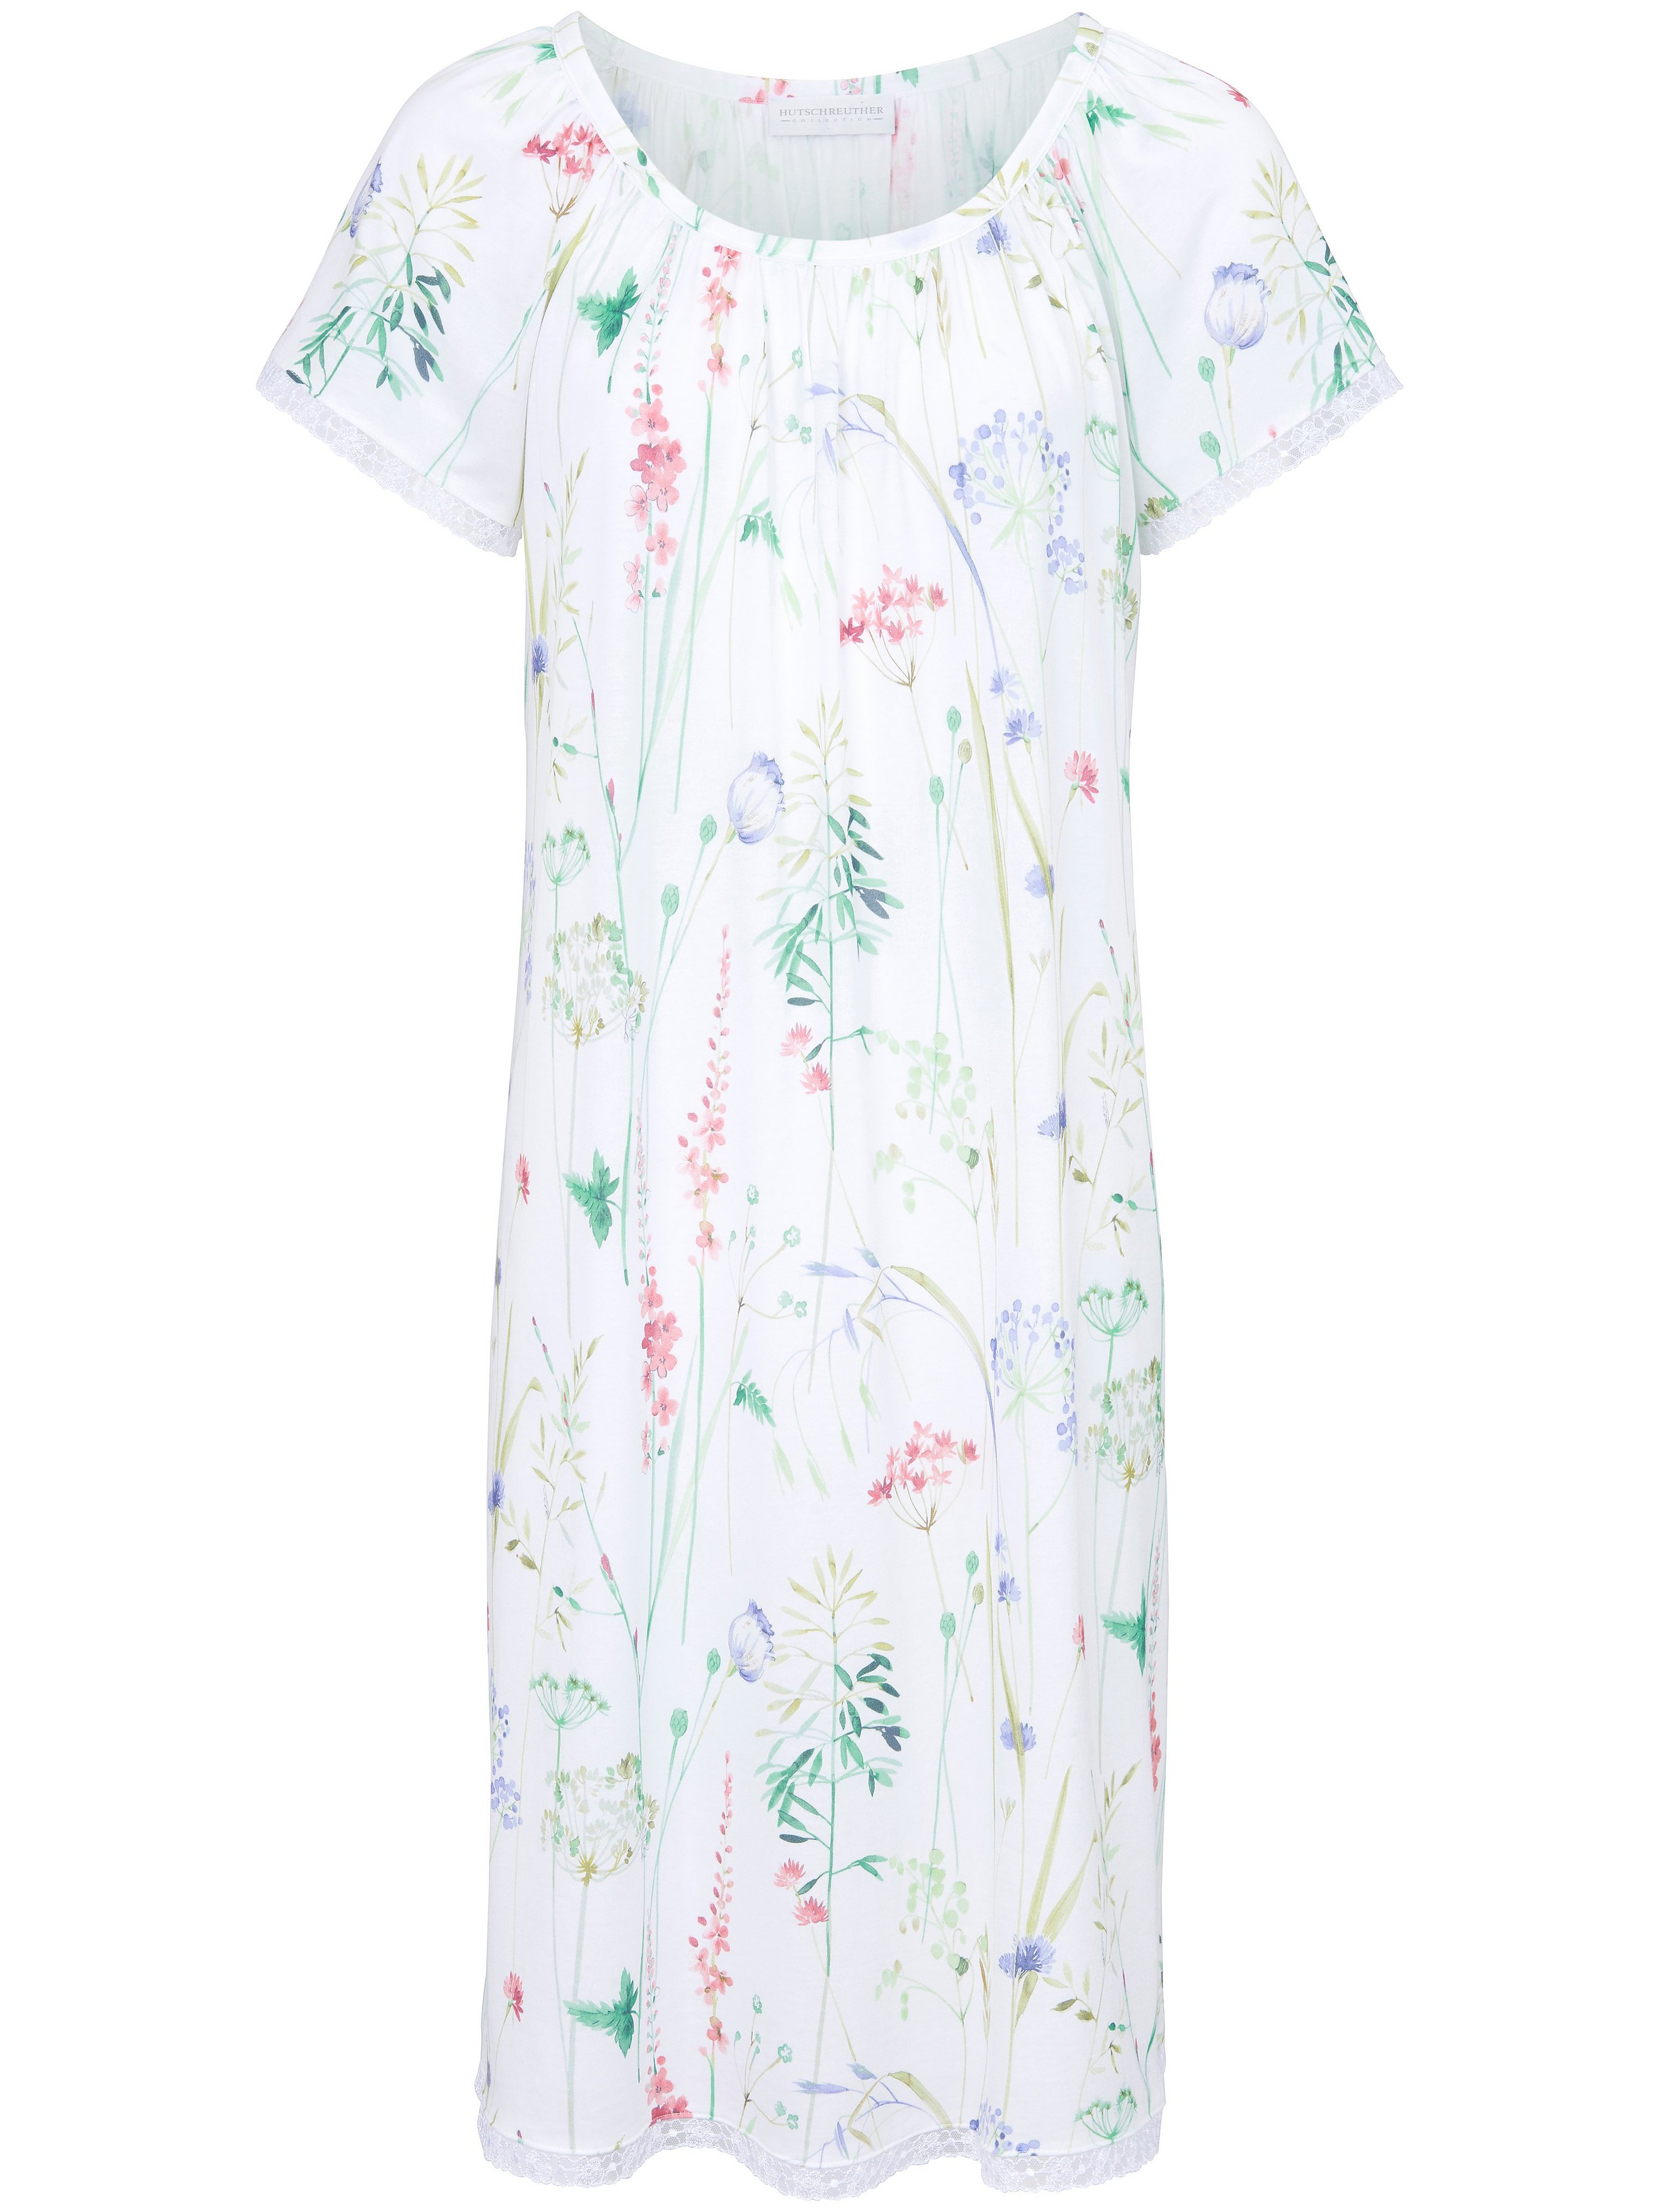 La chemise nuit manches raglan courtes  Hutschreuther multicolore taille 44